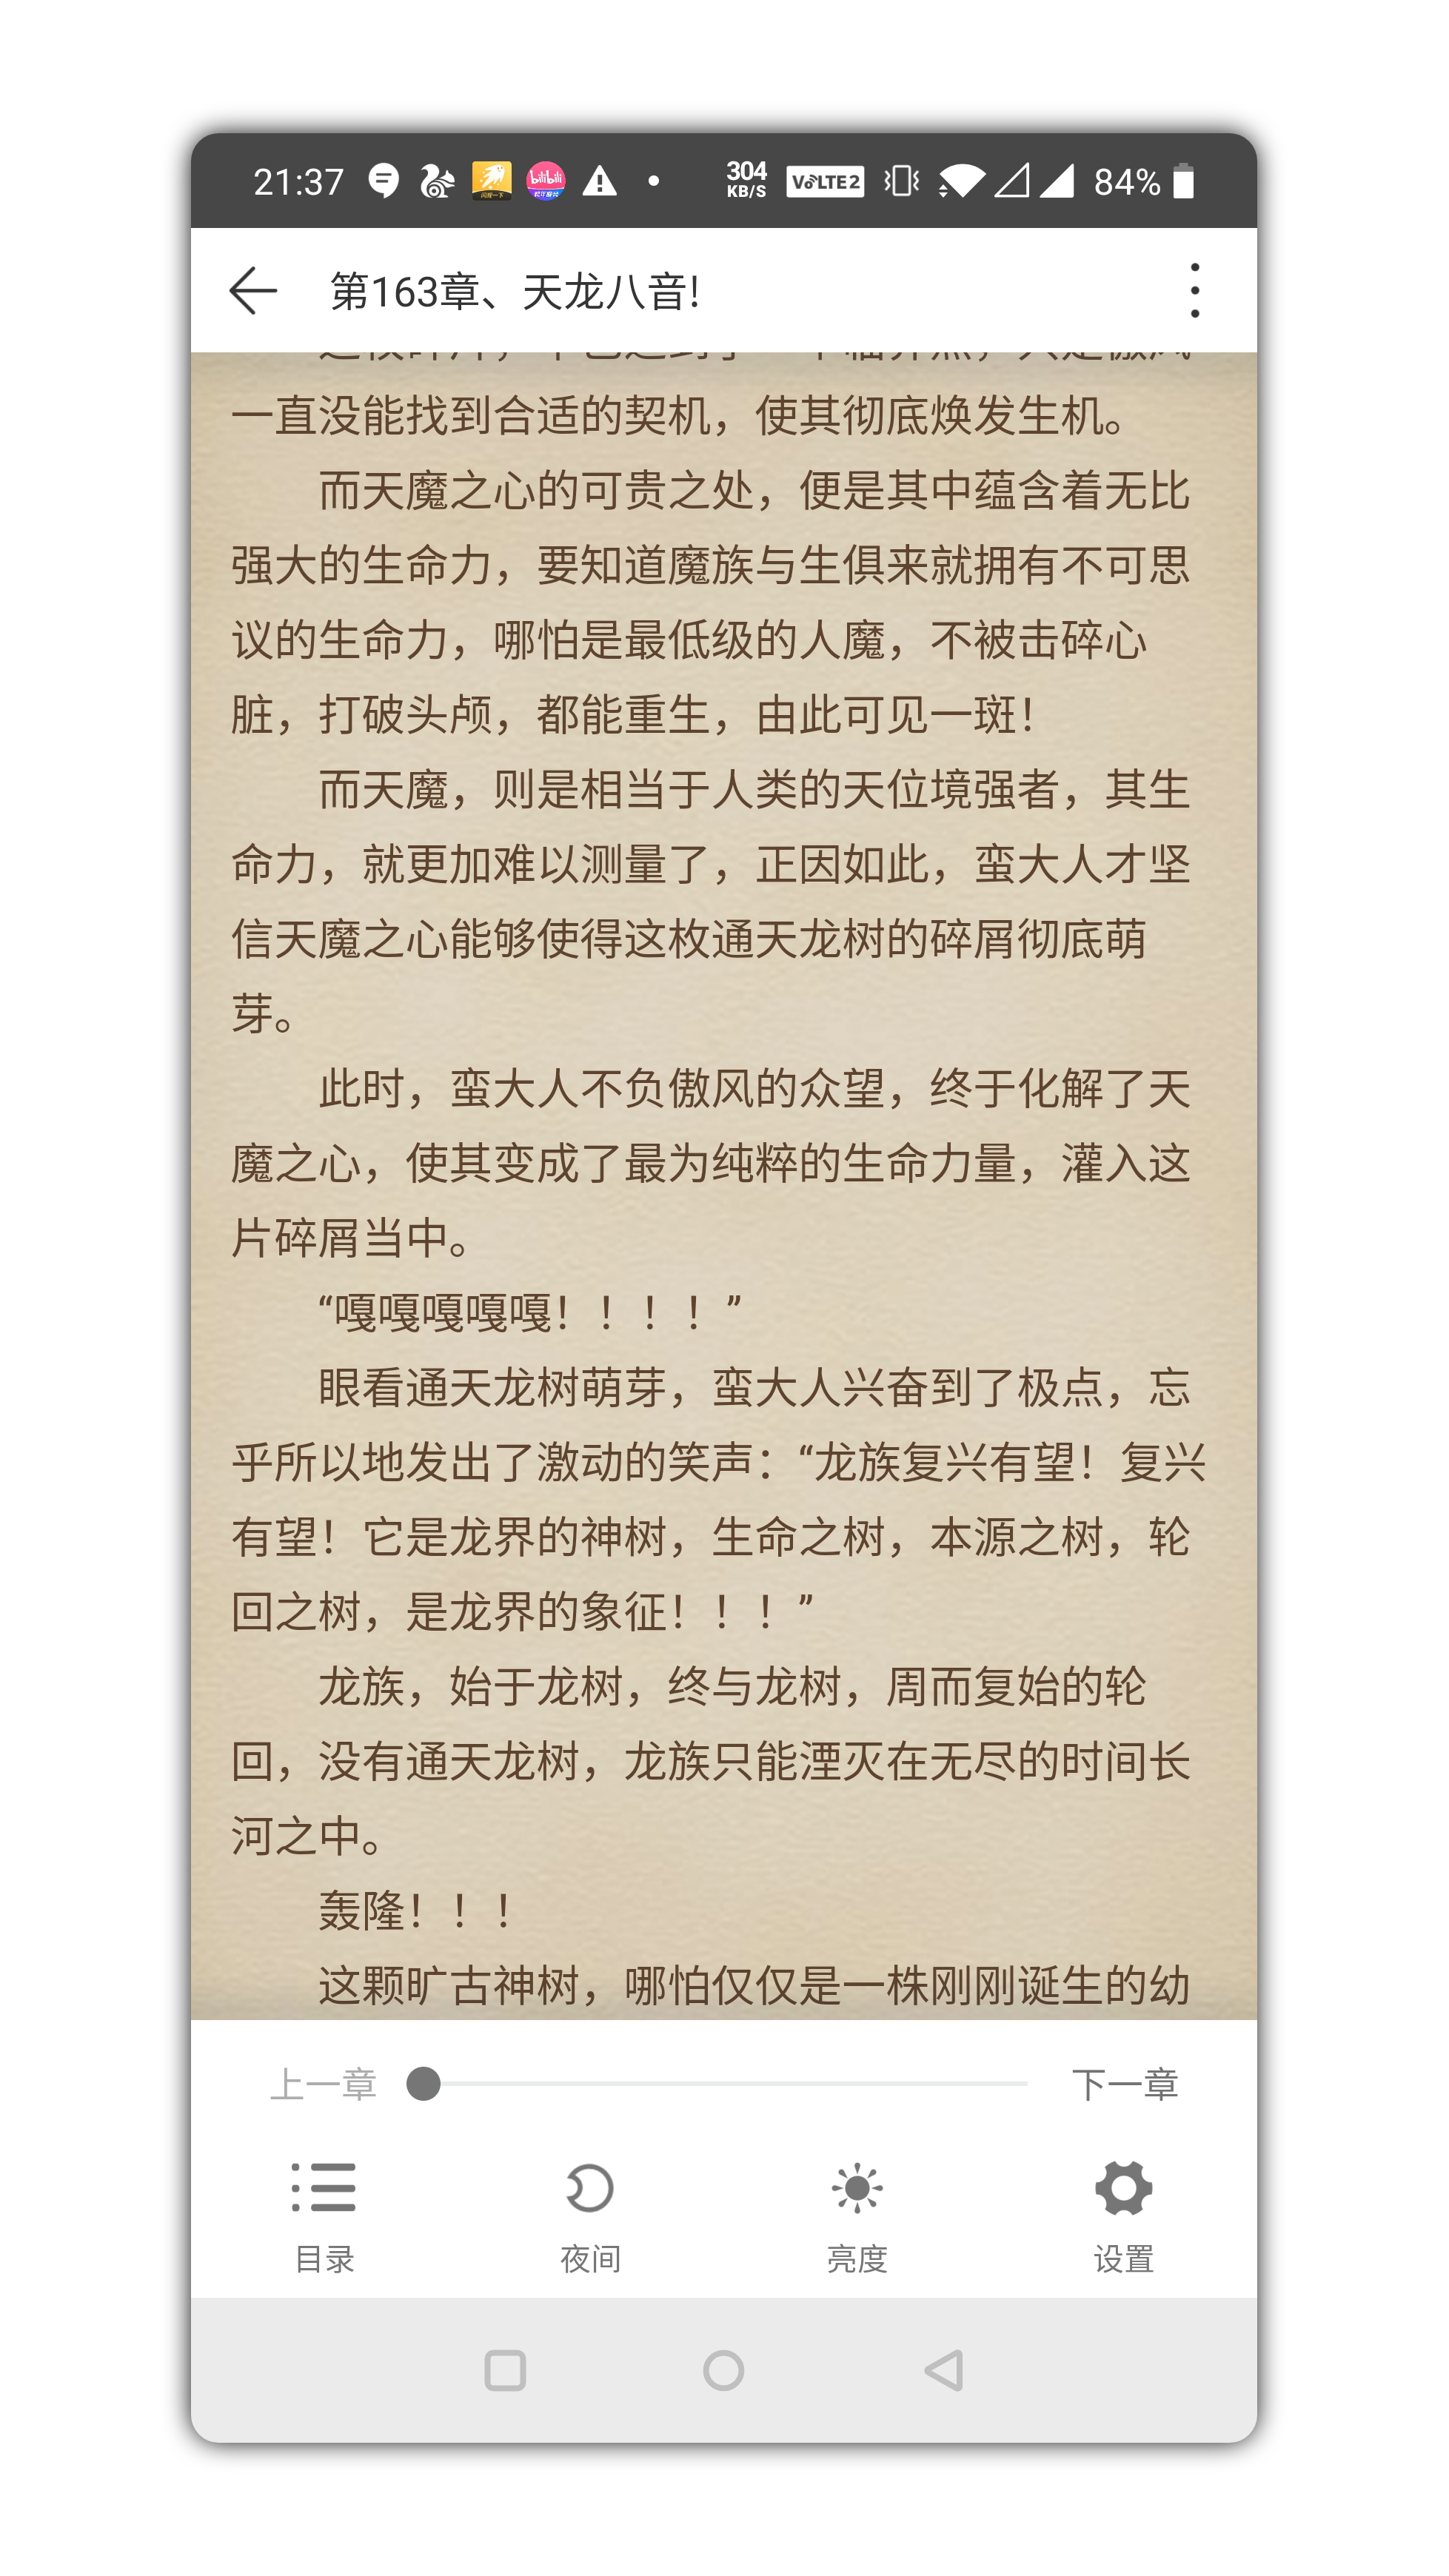 Sisters小说优化版截图2